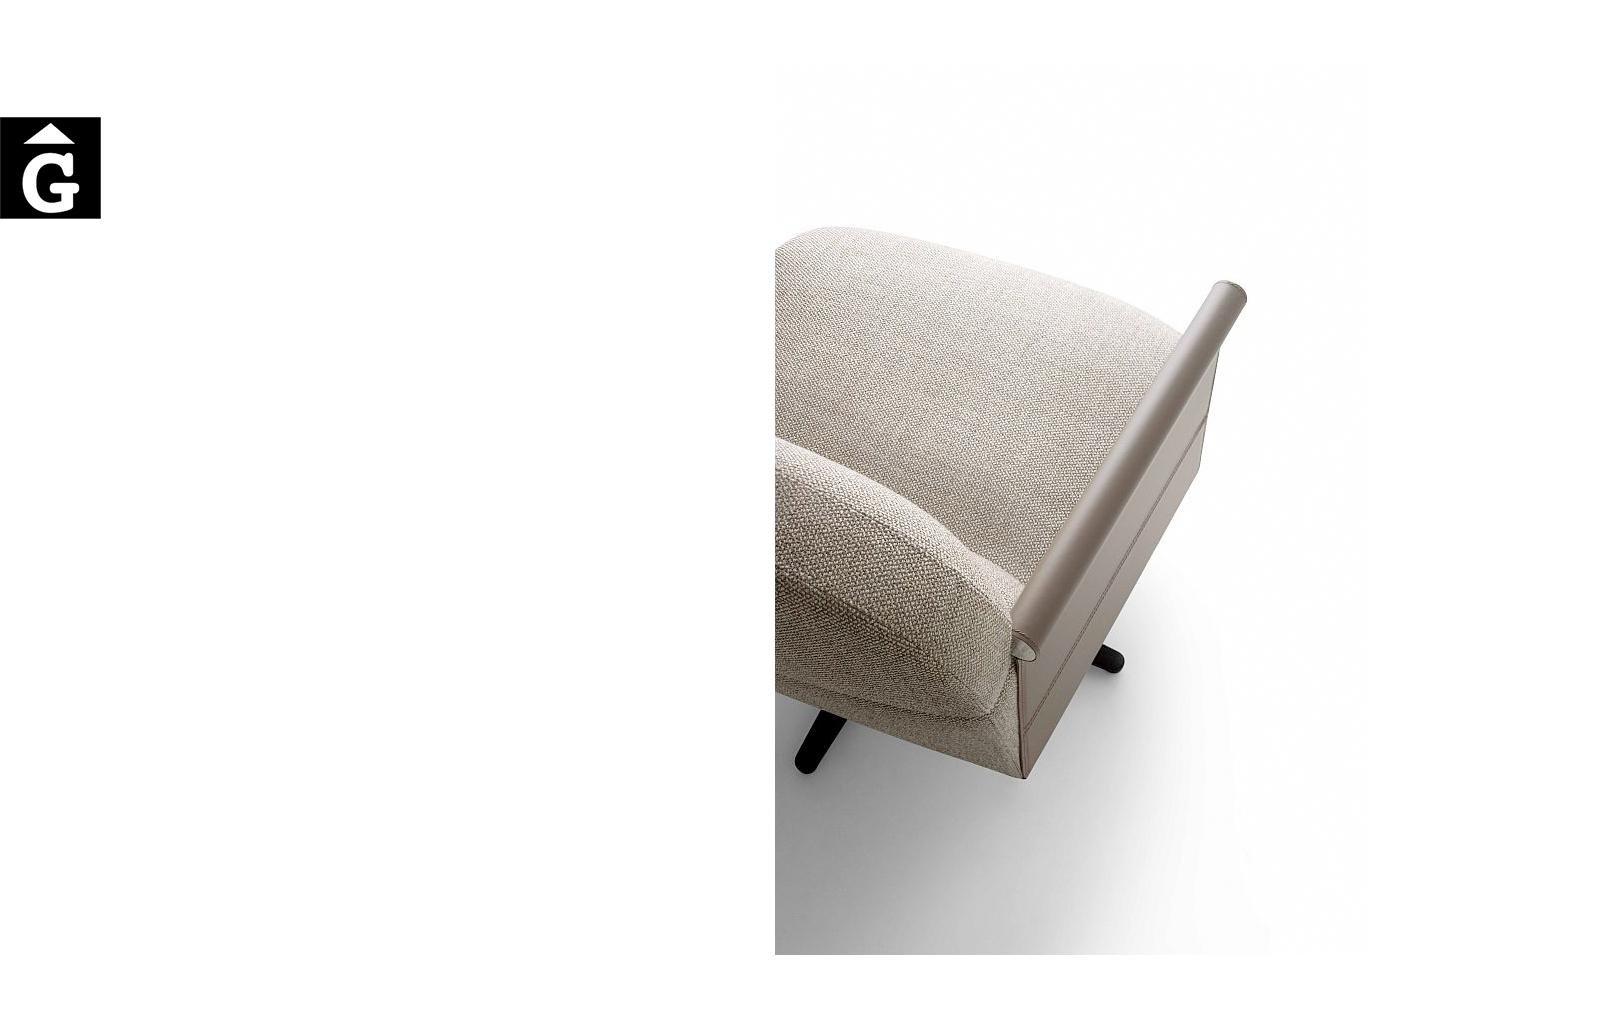 Butaca Beyl detal braç pell – Ditre Italia Sofas disseny i qualitat alta by mobles Gifreu